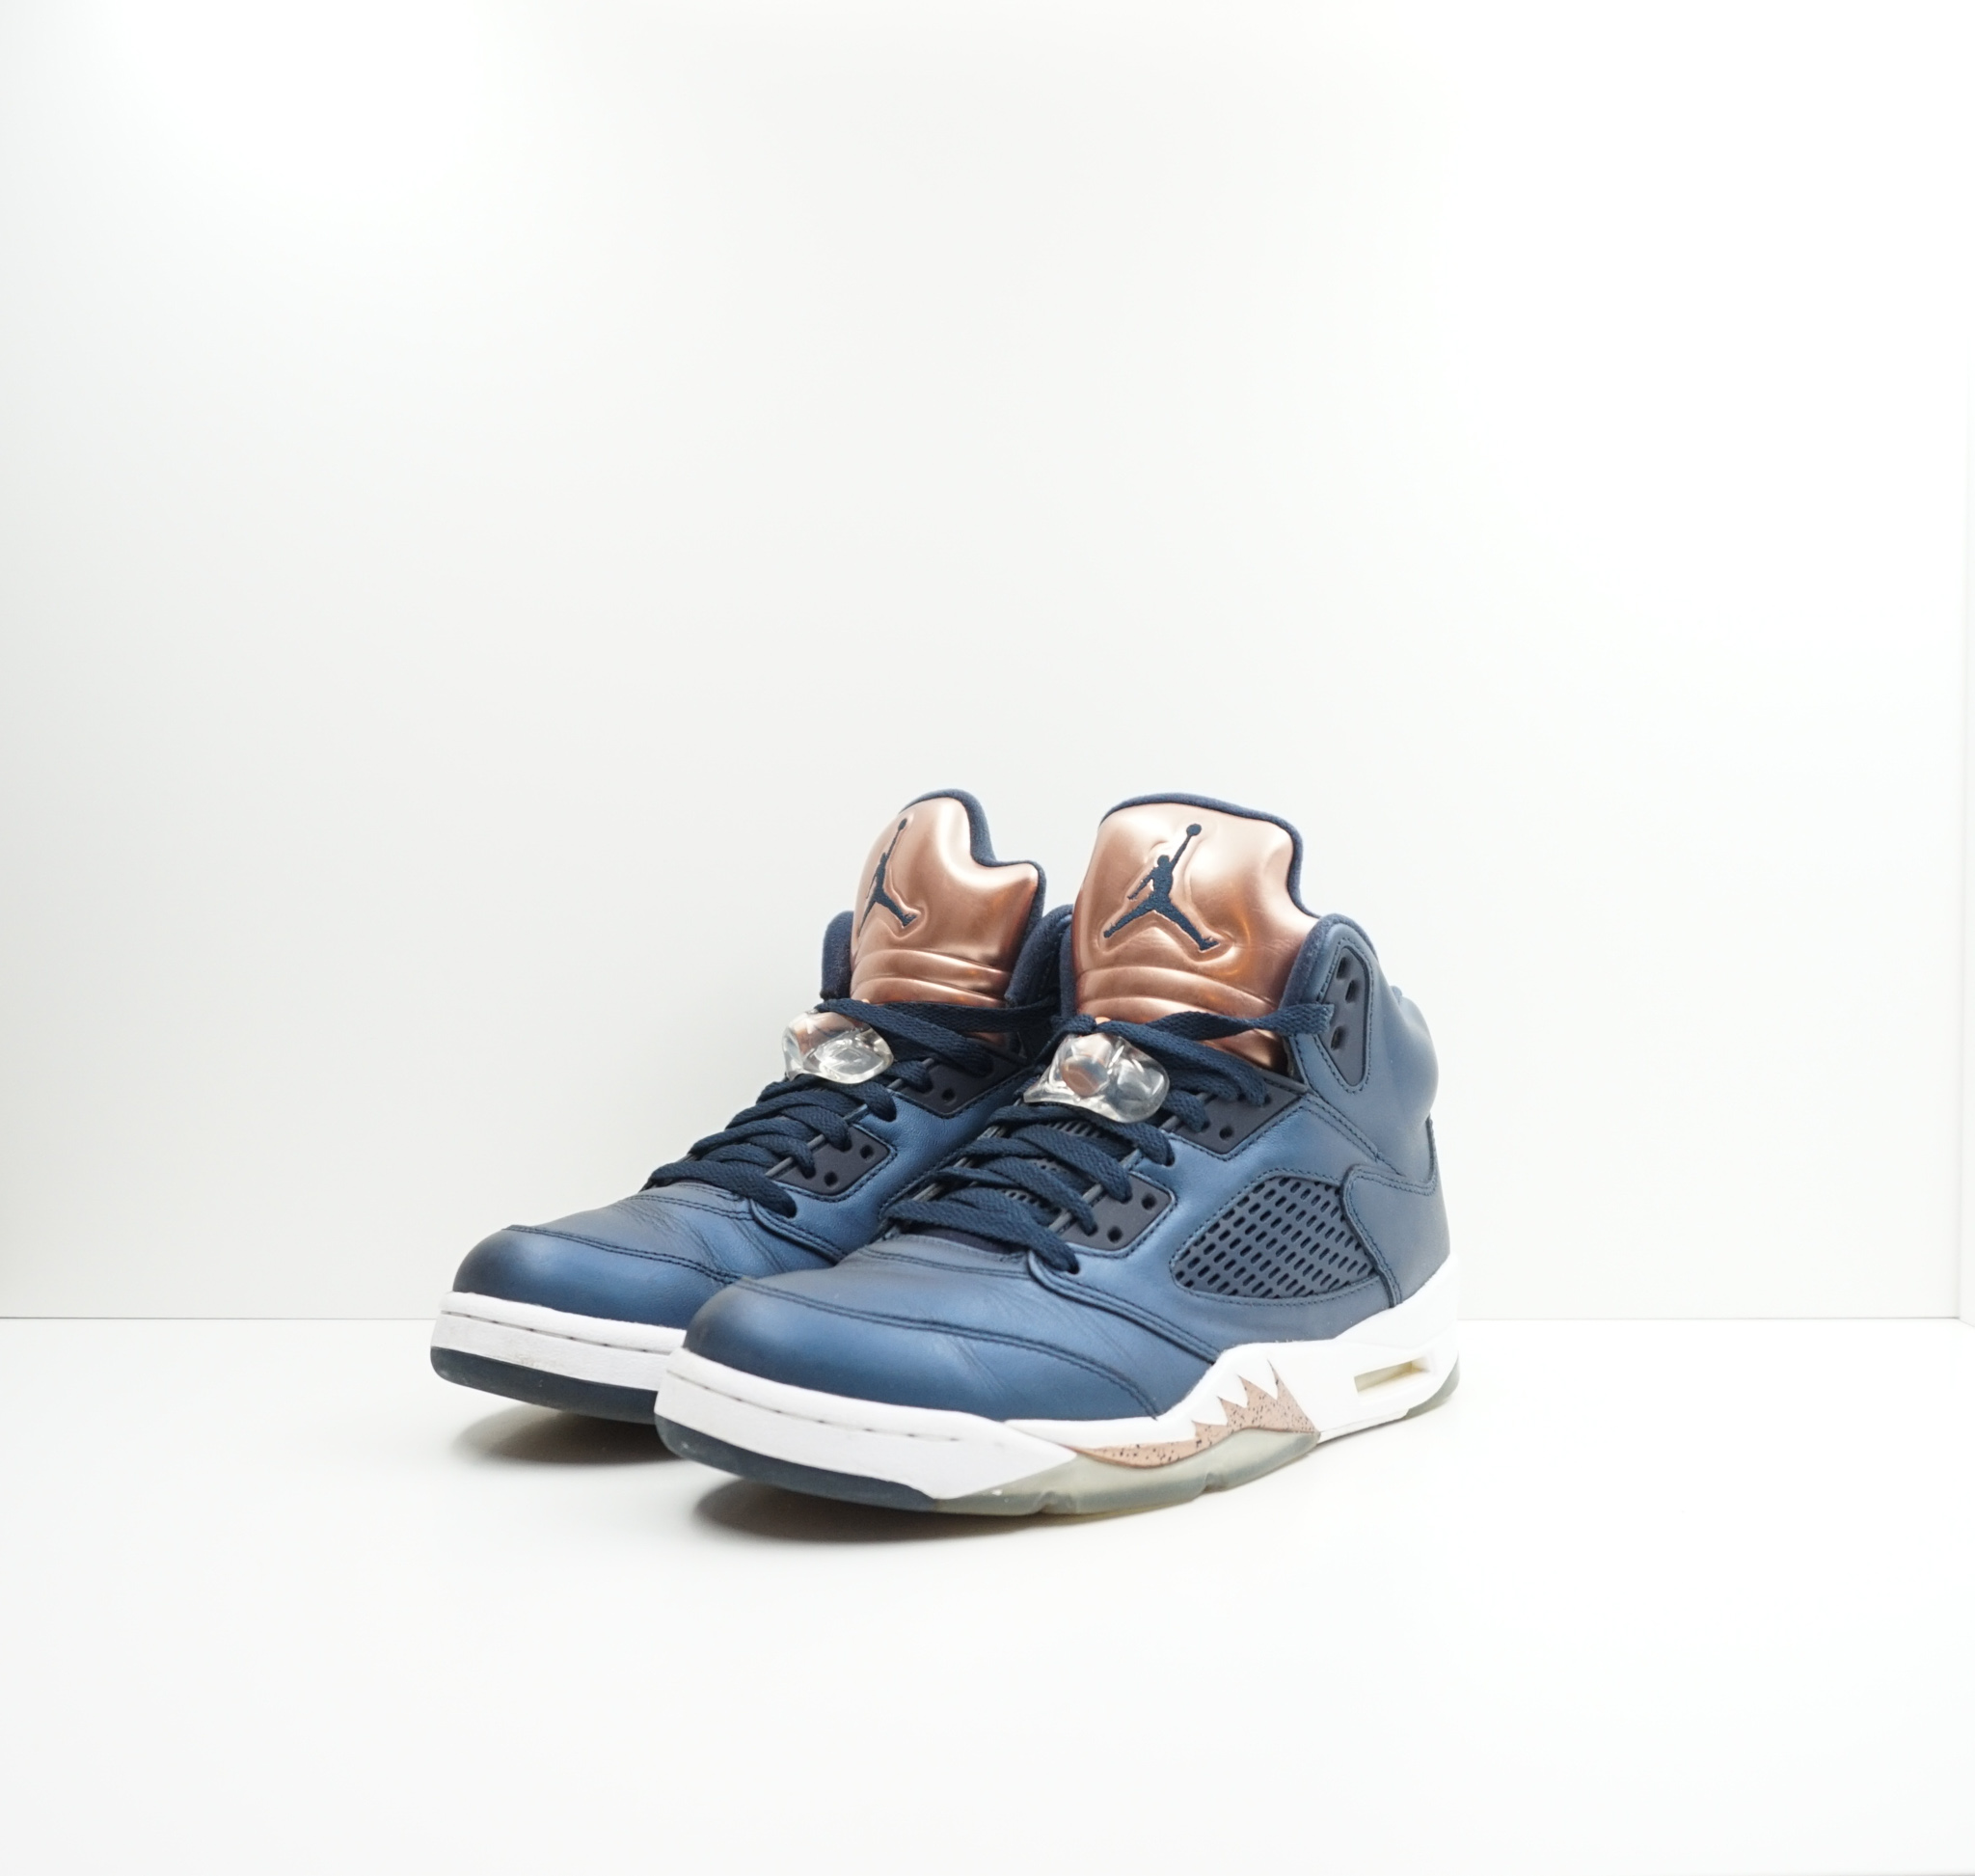 Jordan 5 Retro Bronze